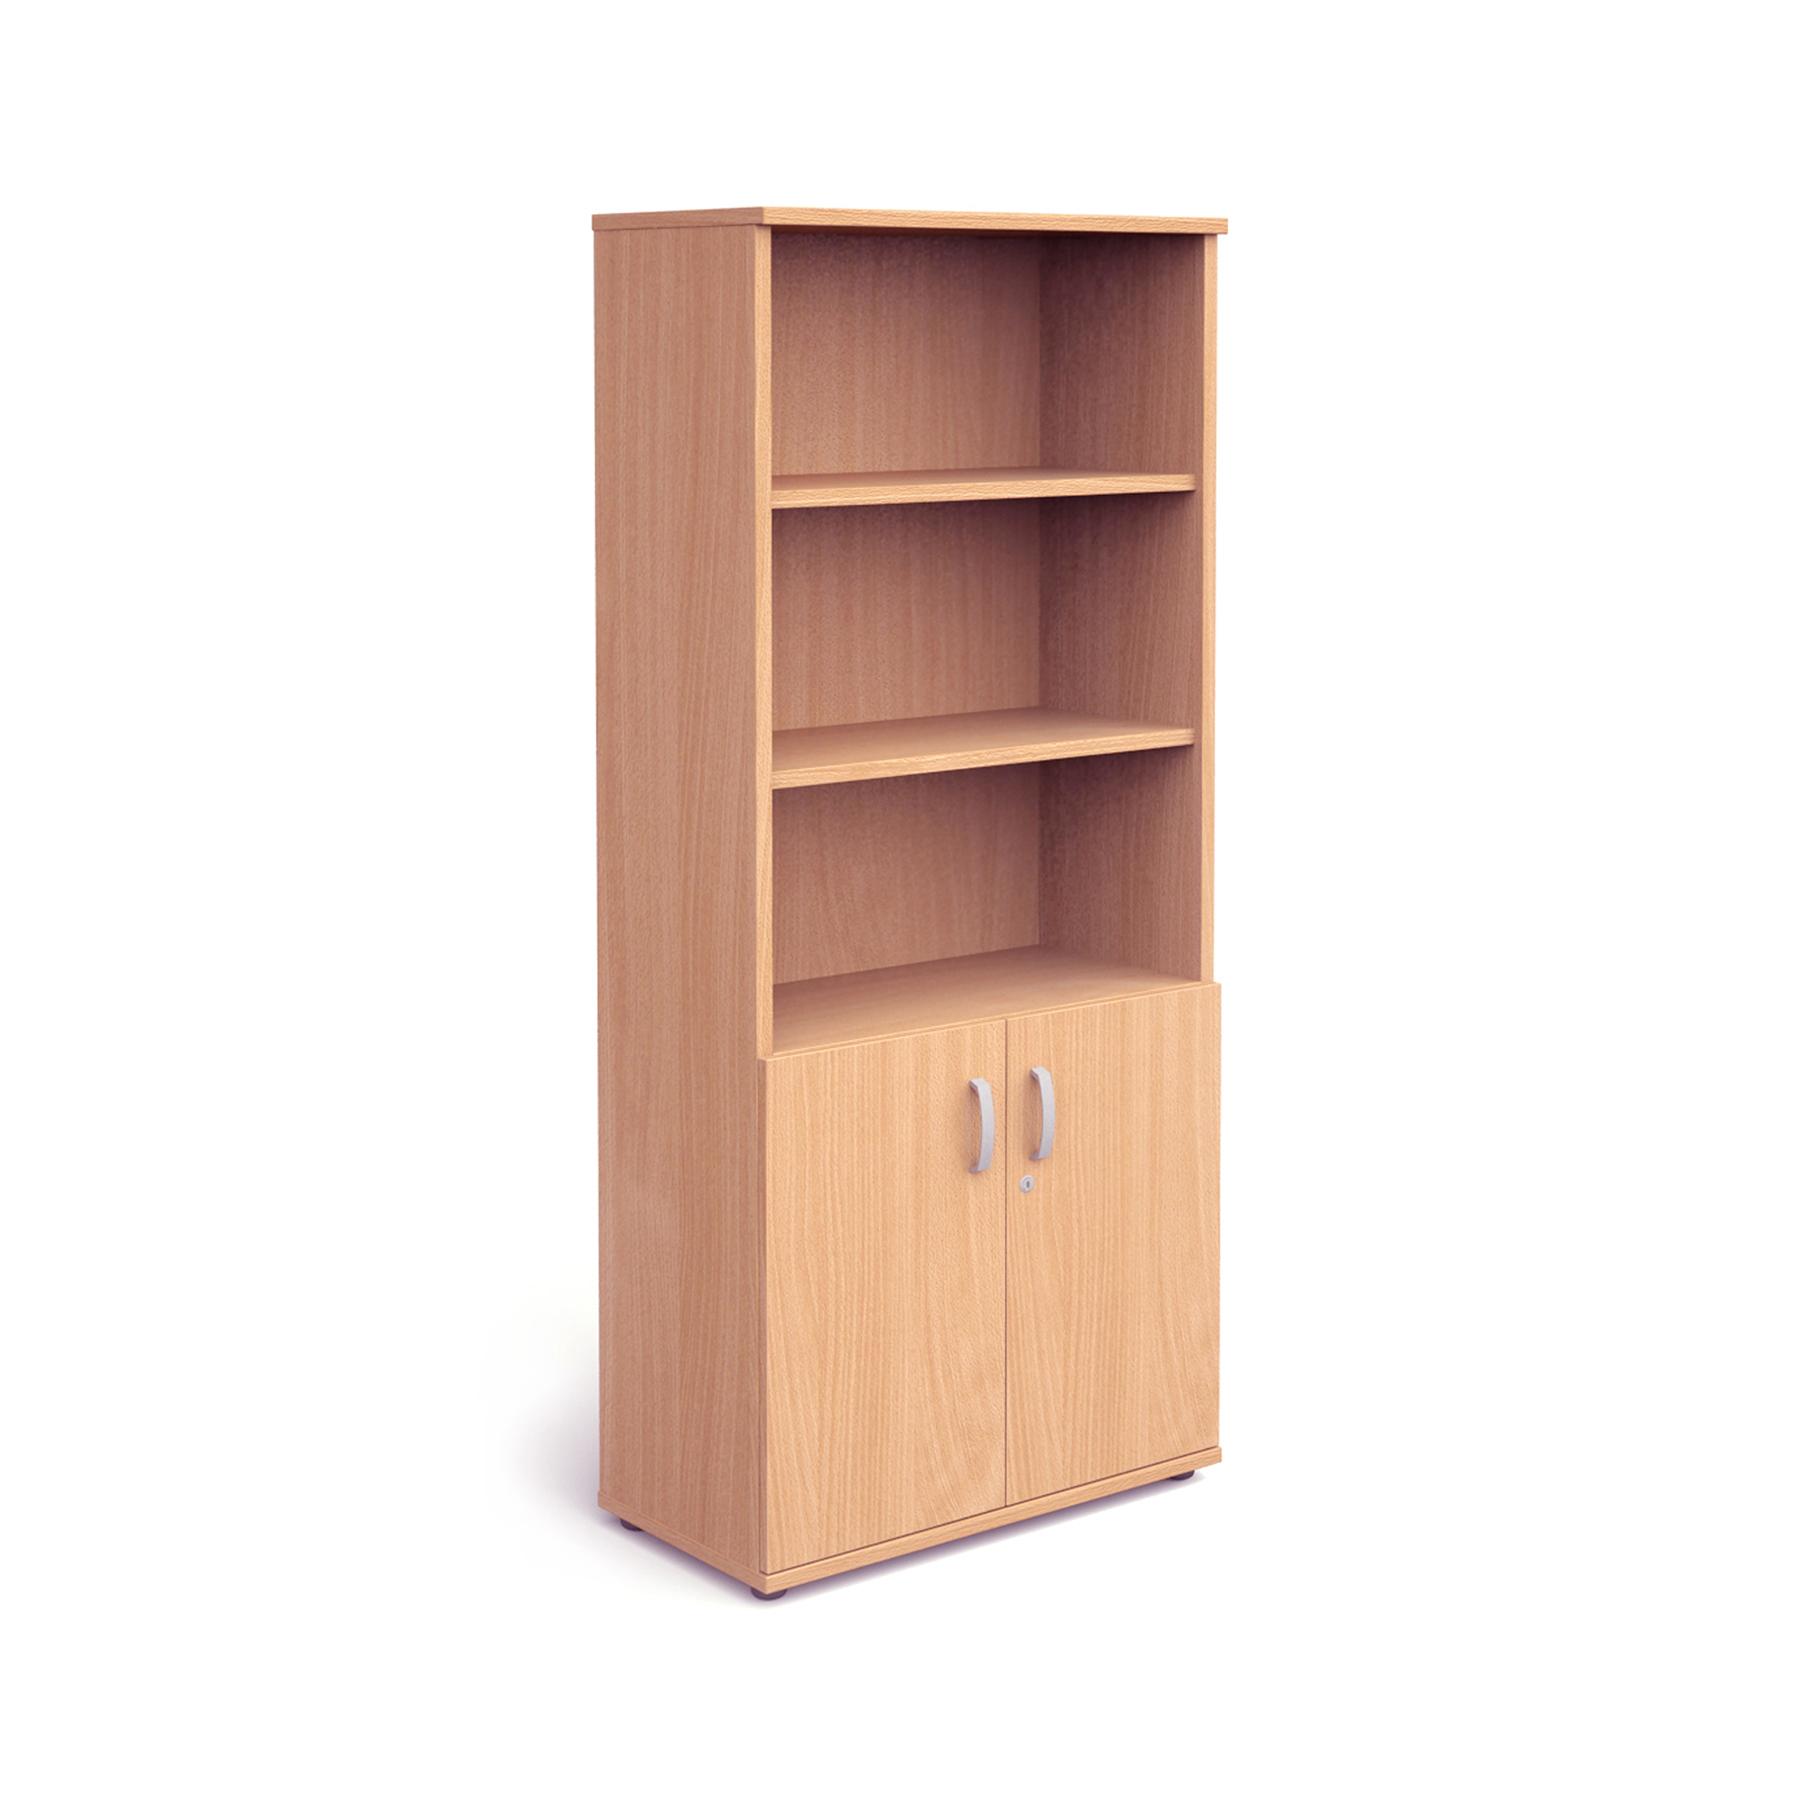 Trexus Cupboard Open Shelves 2000x800x400mm Beech Ref I000047